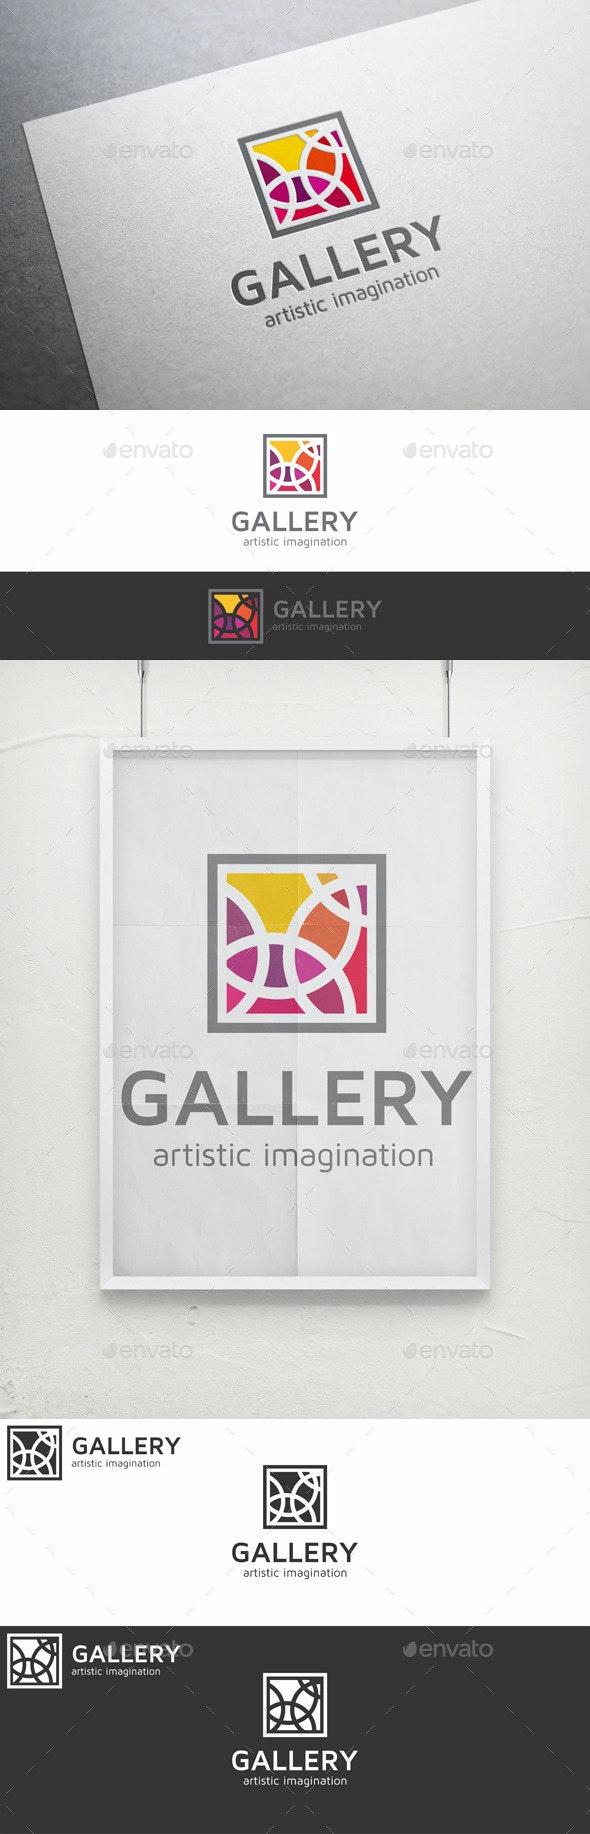 Art Images Creative Circles Logo - Symbols Logo Templates